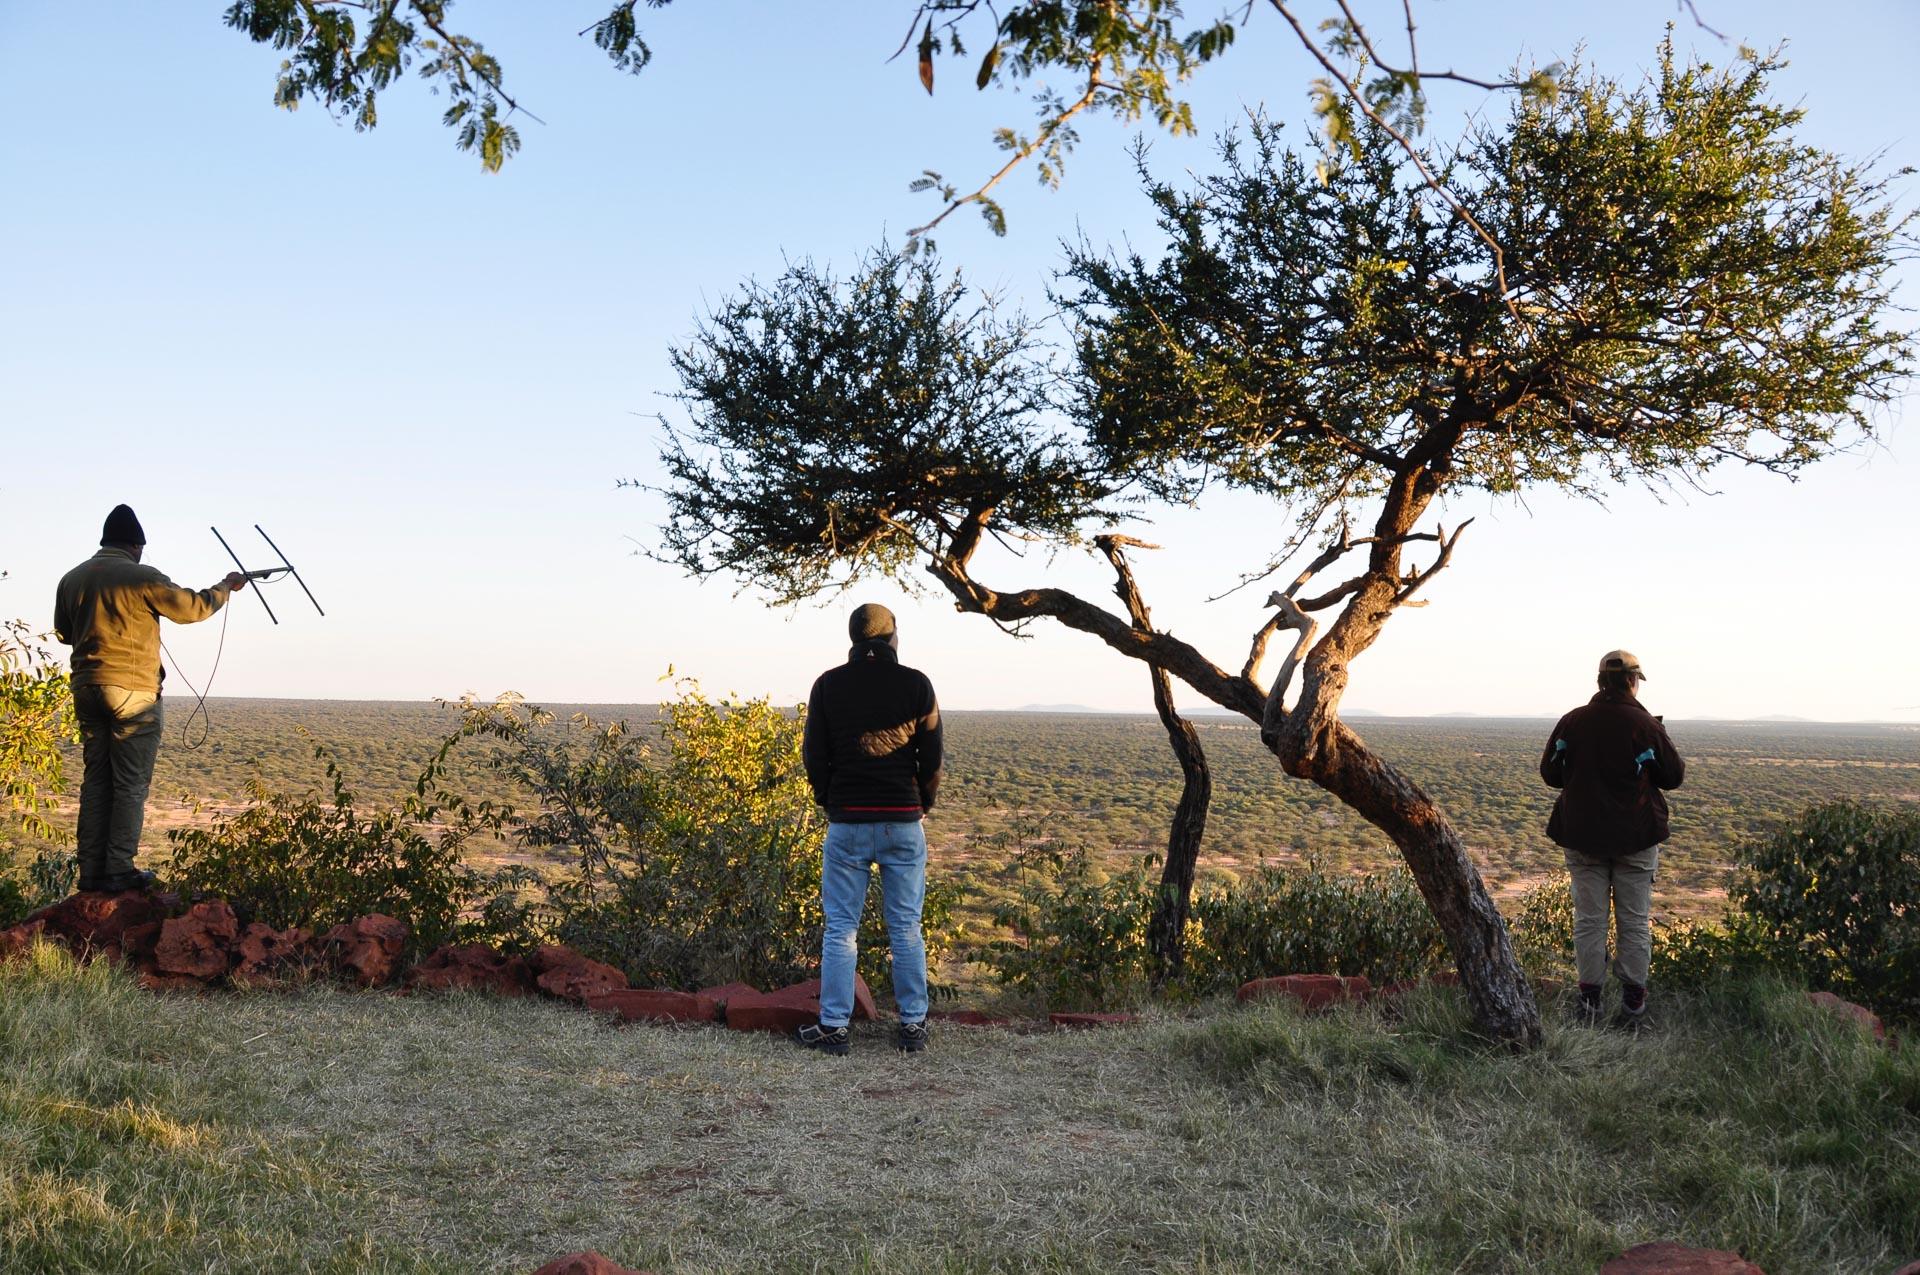 Okonjima-Namibia-Globetrotter-Select-8